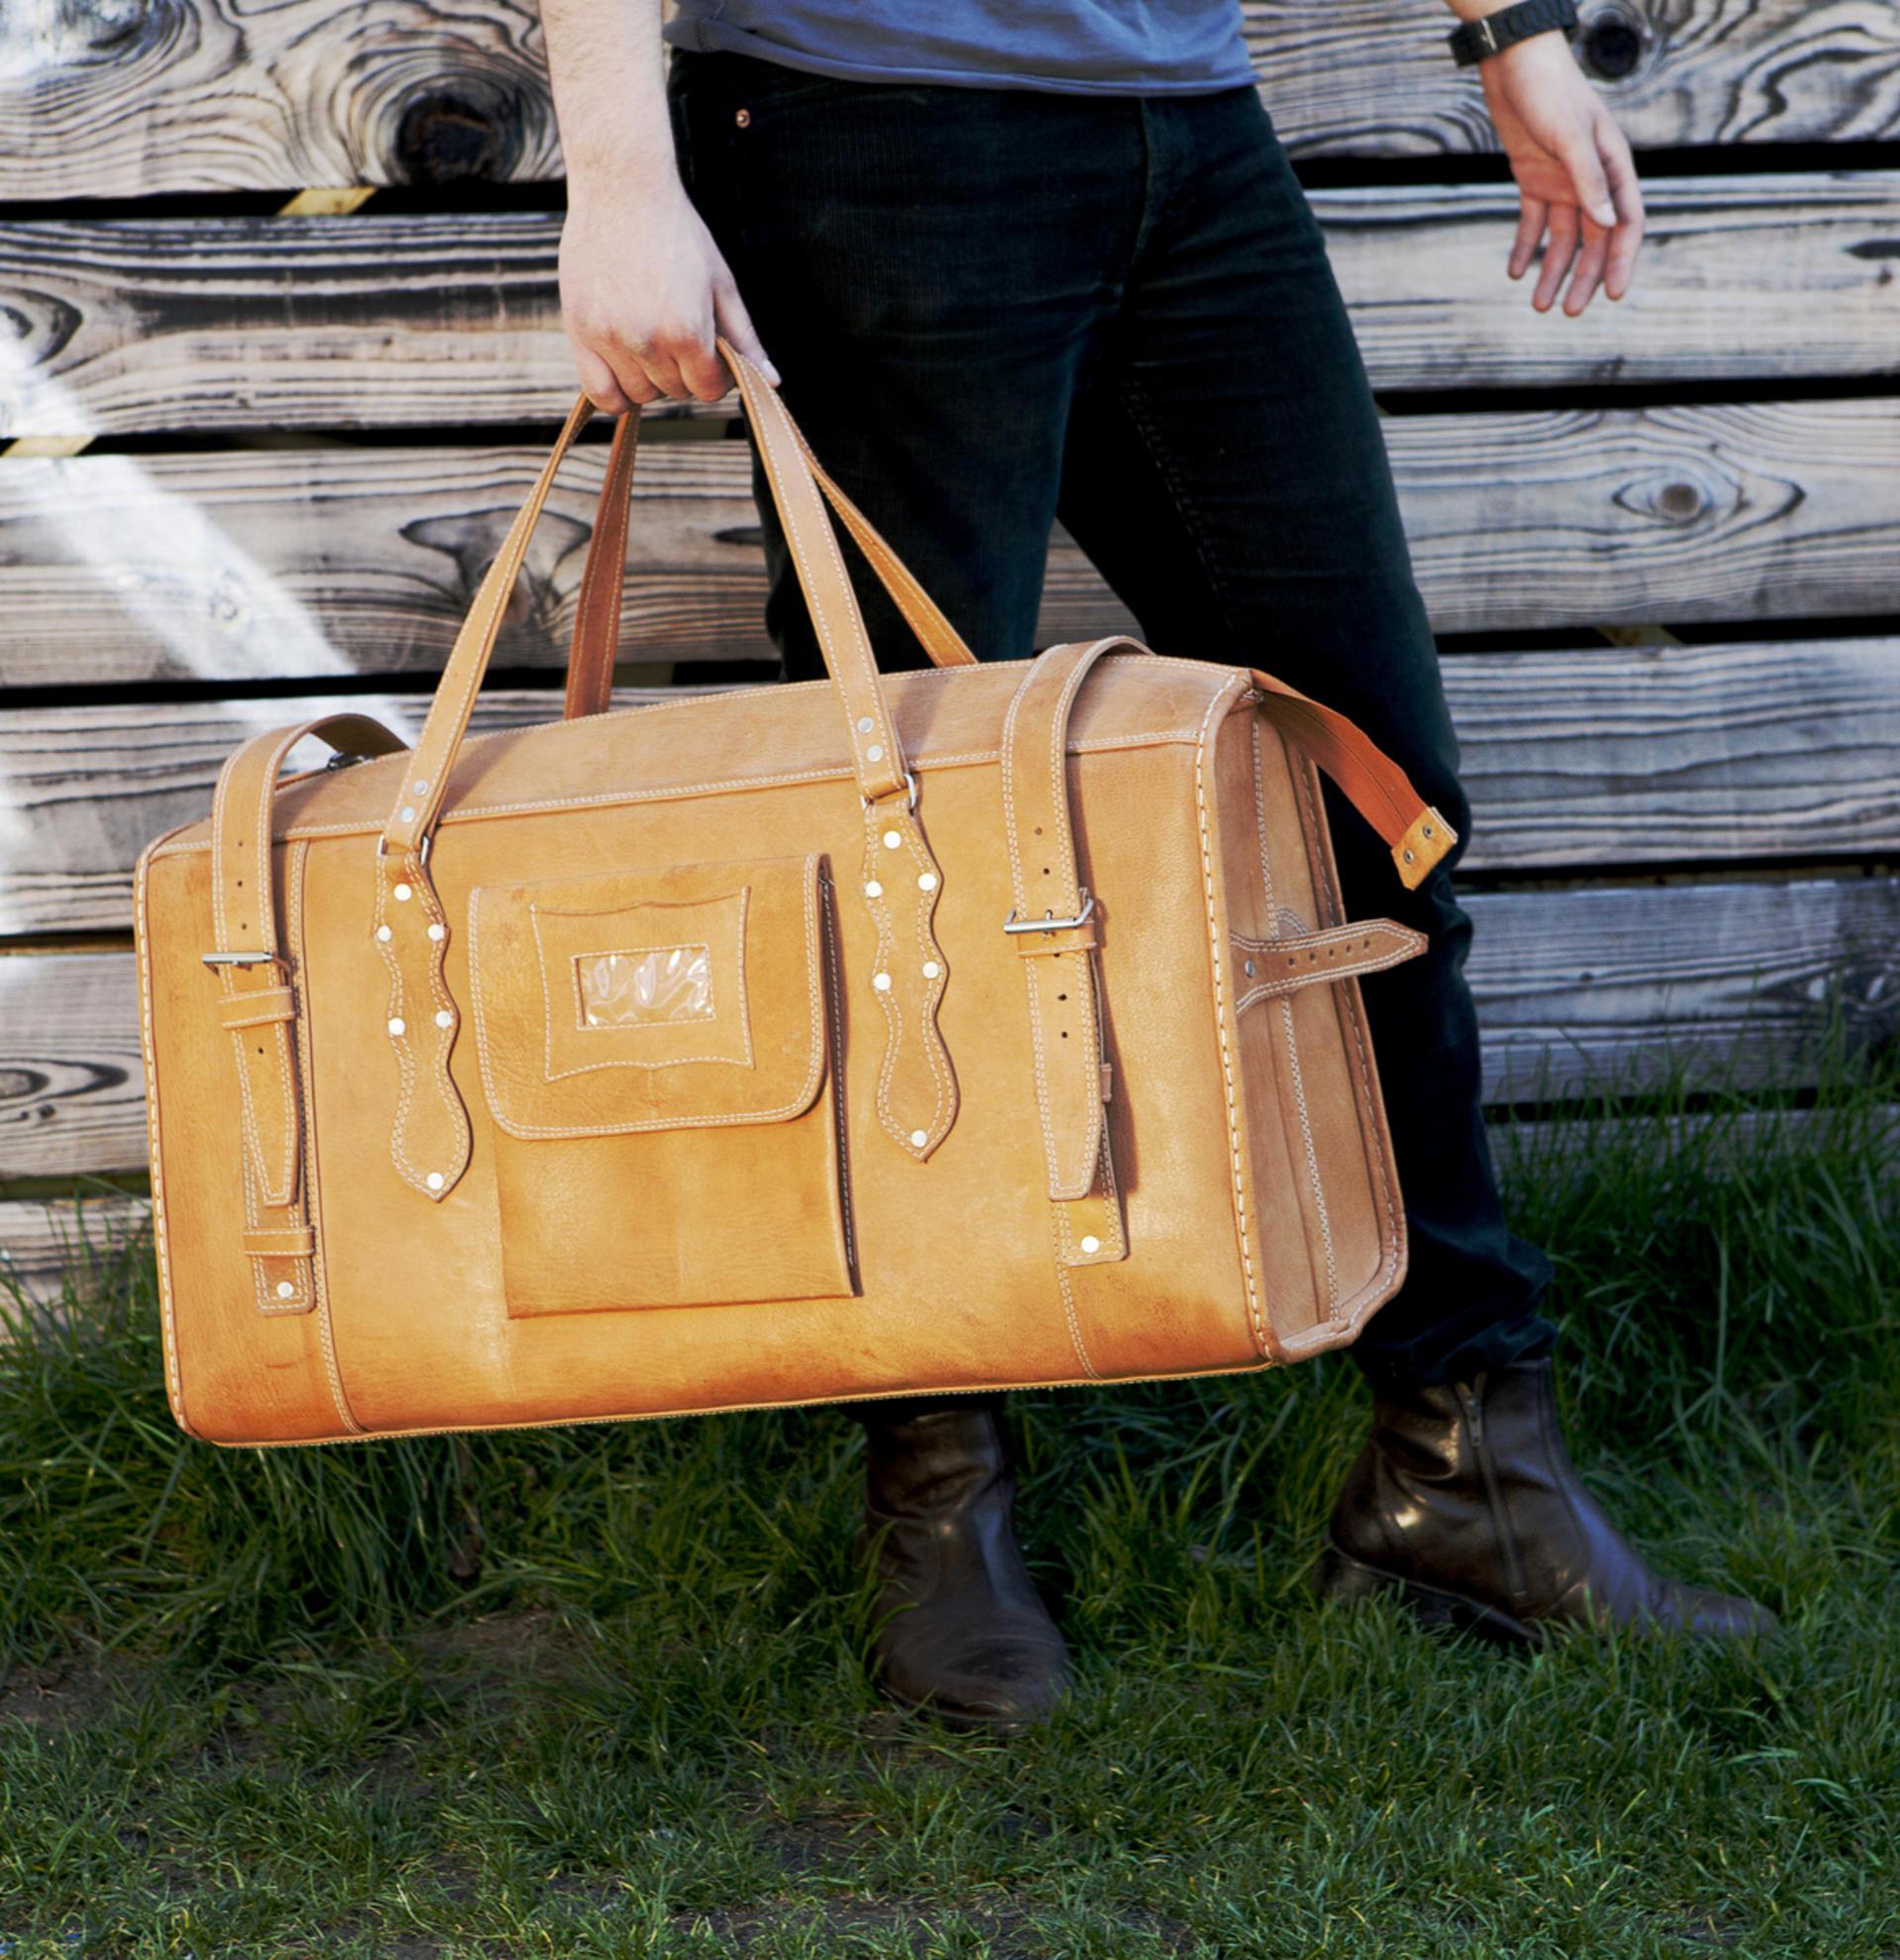 traveller classic grand sac de voyage en cuir naturel. Black Bedroom Furniture Sets. Home Design Ideas